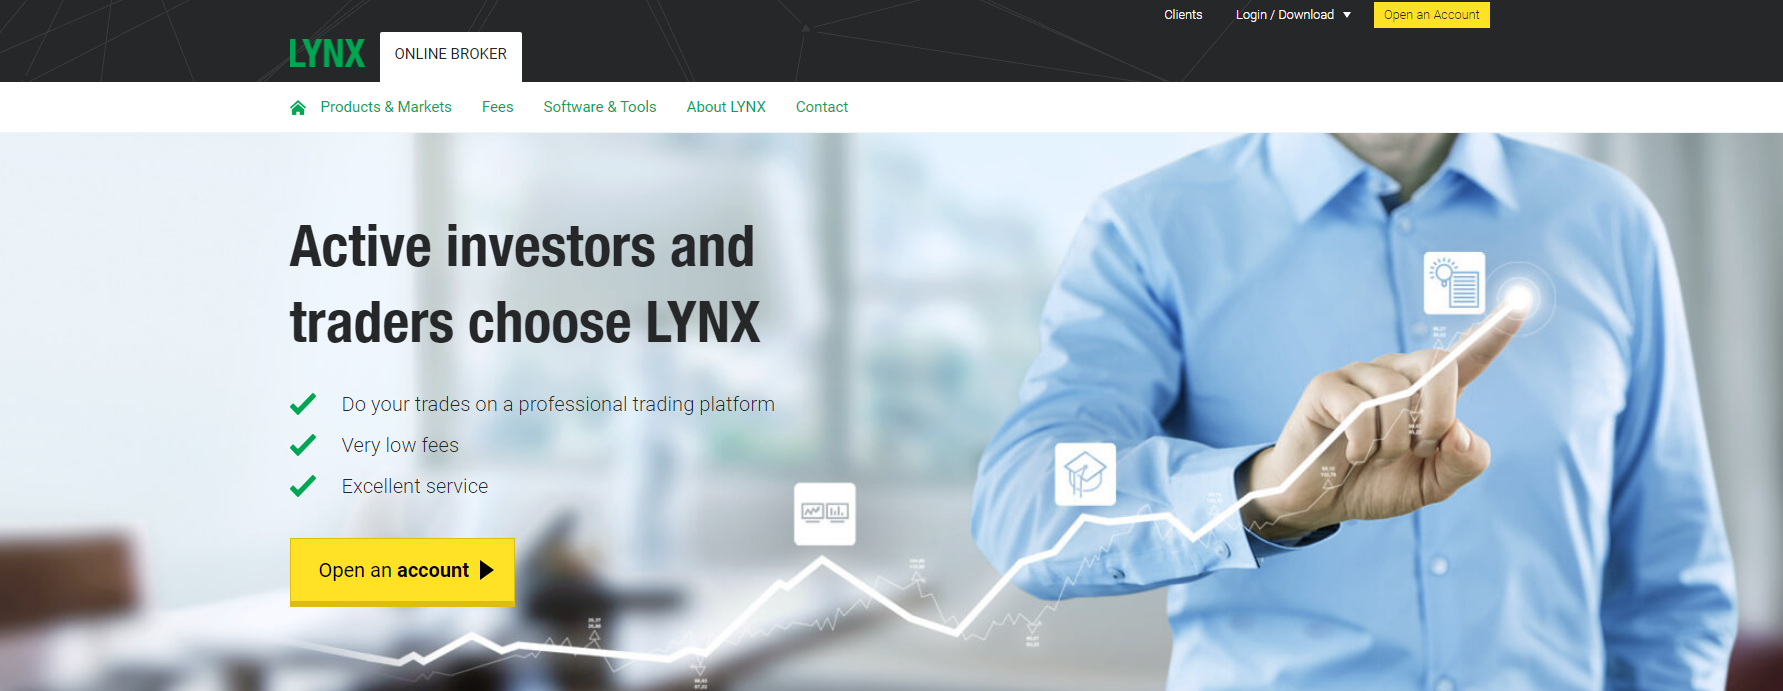 lynx broker официальный сайт брокера